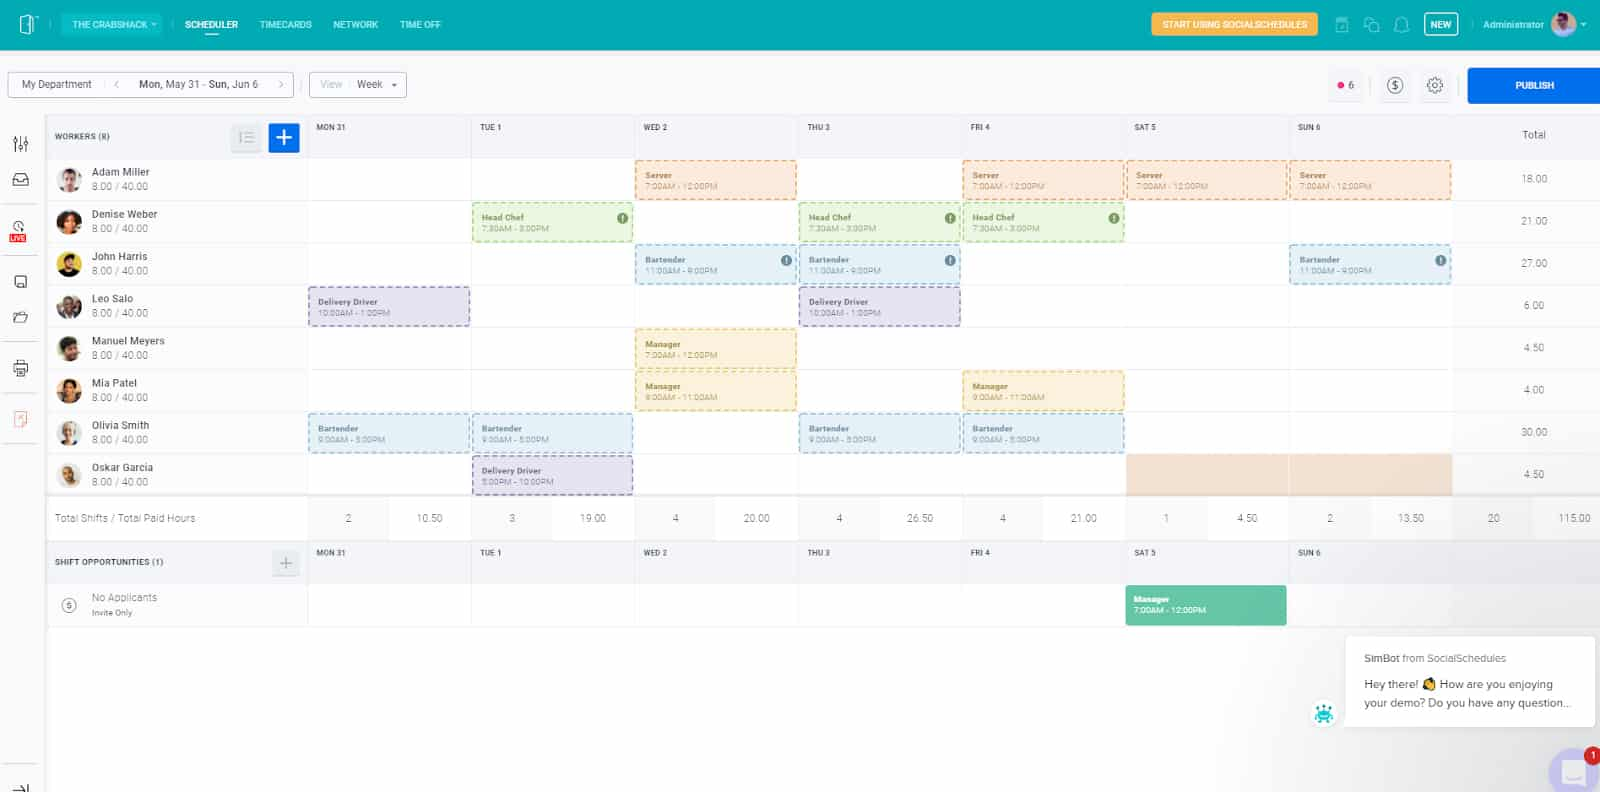 Screenshot of SocialSchedules scheduling dashboard